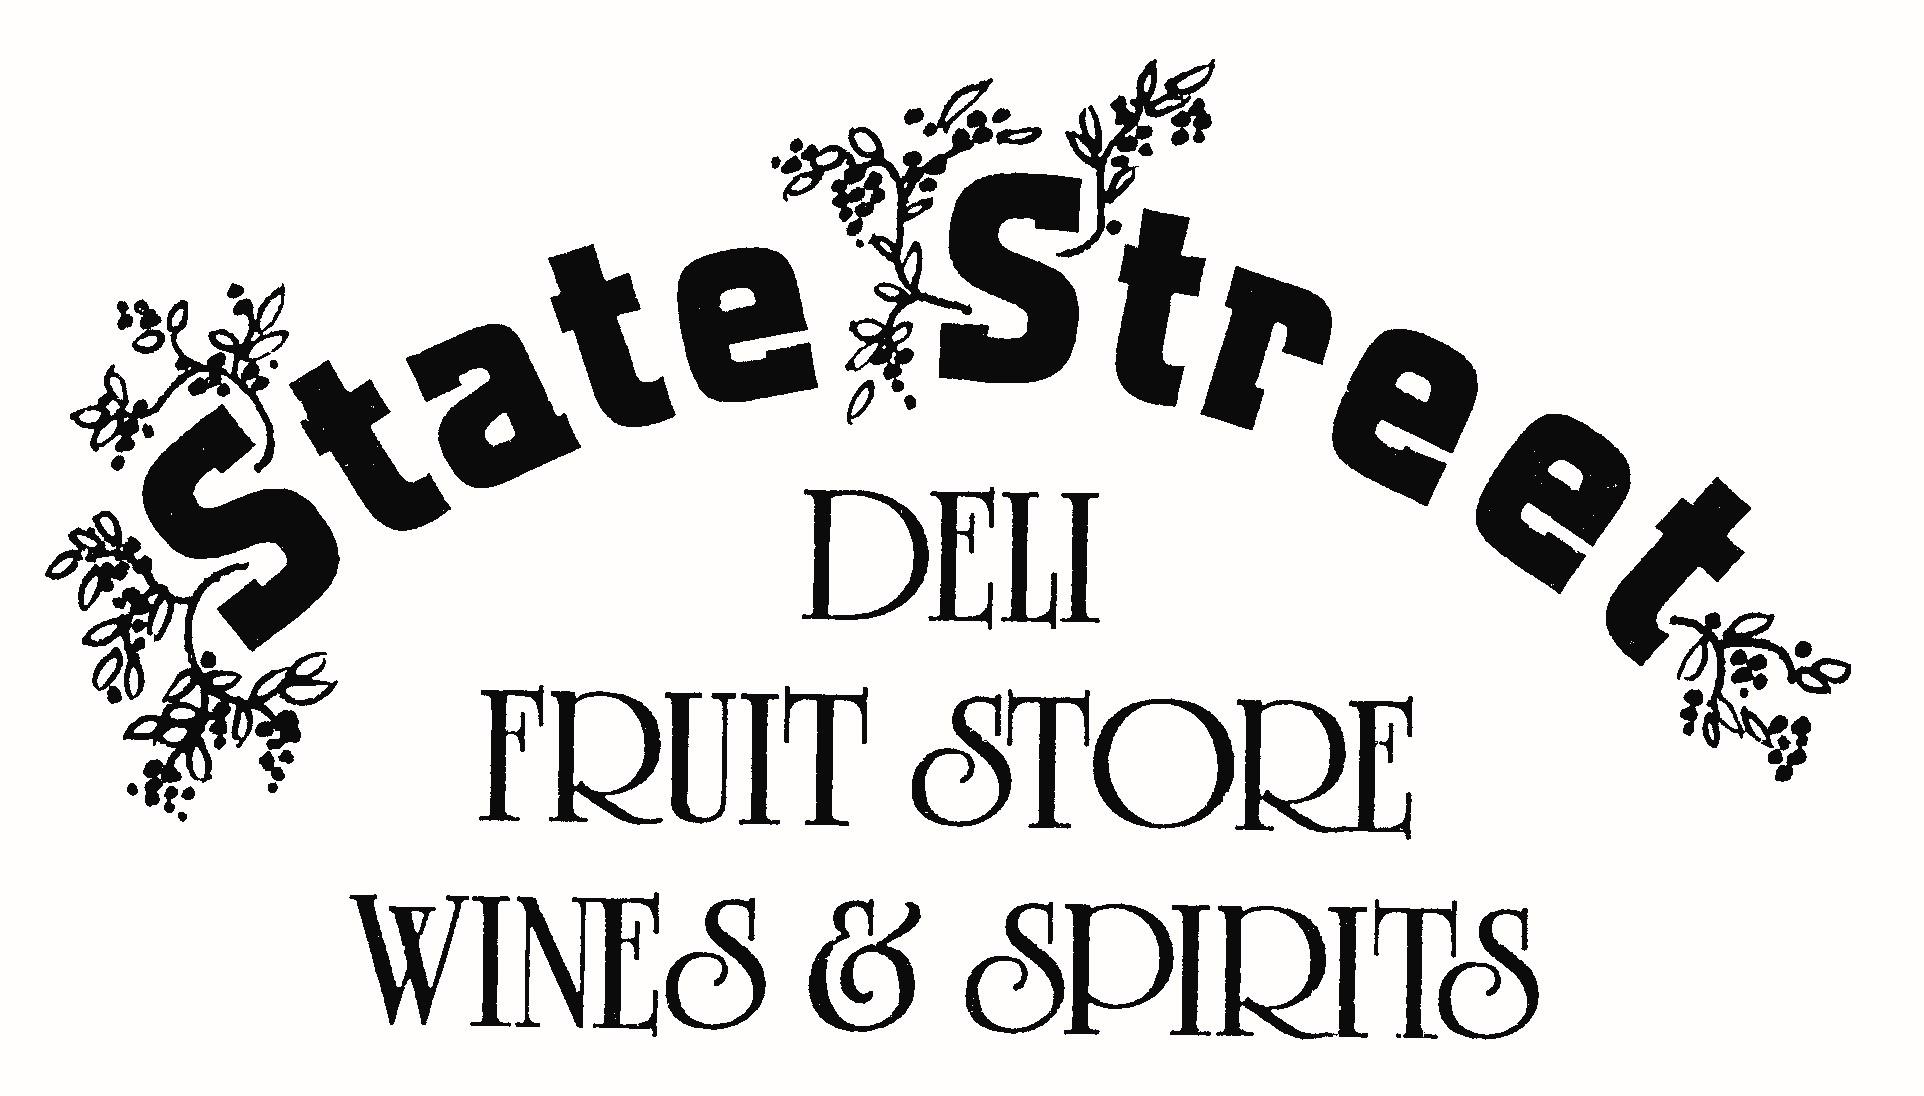 State Street Deli & Fruit Store